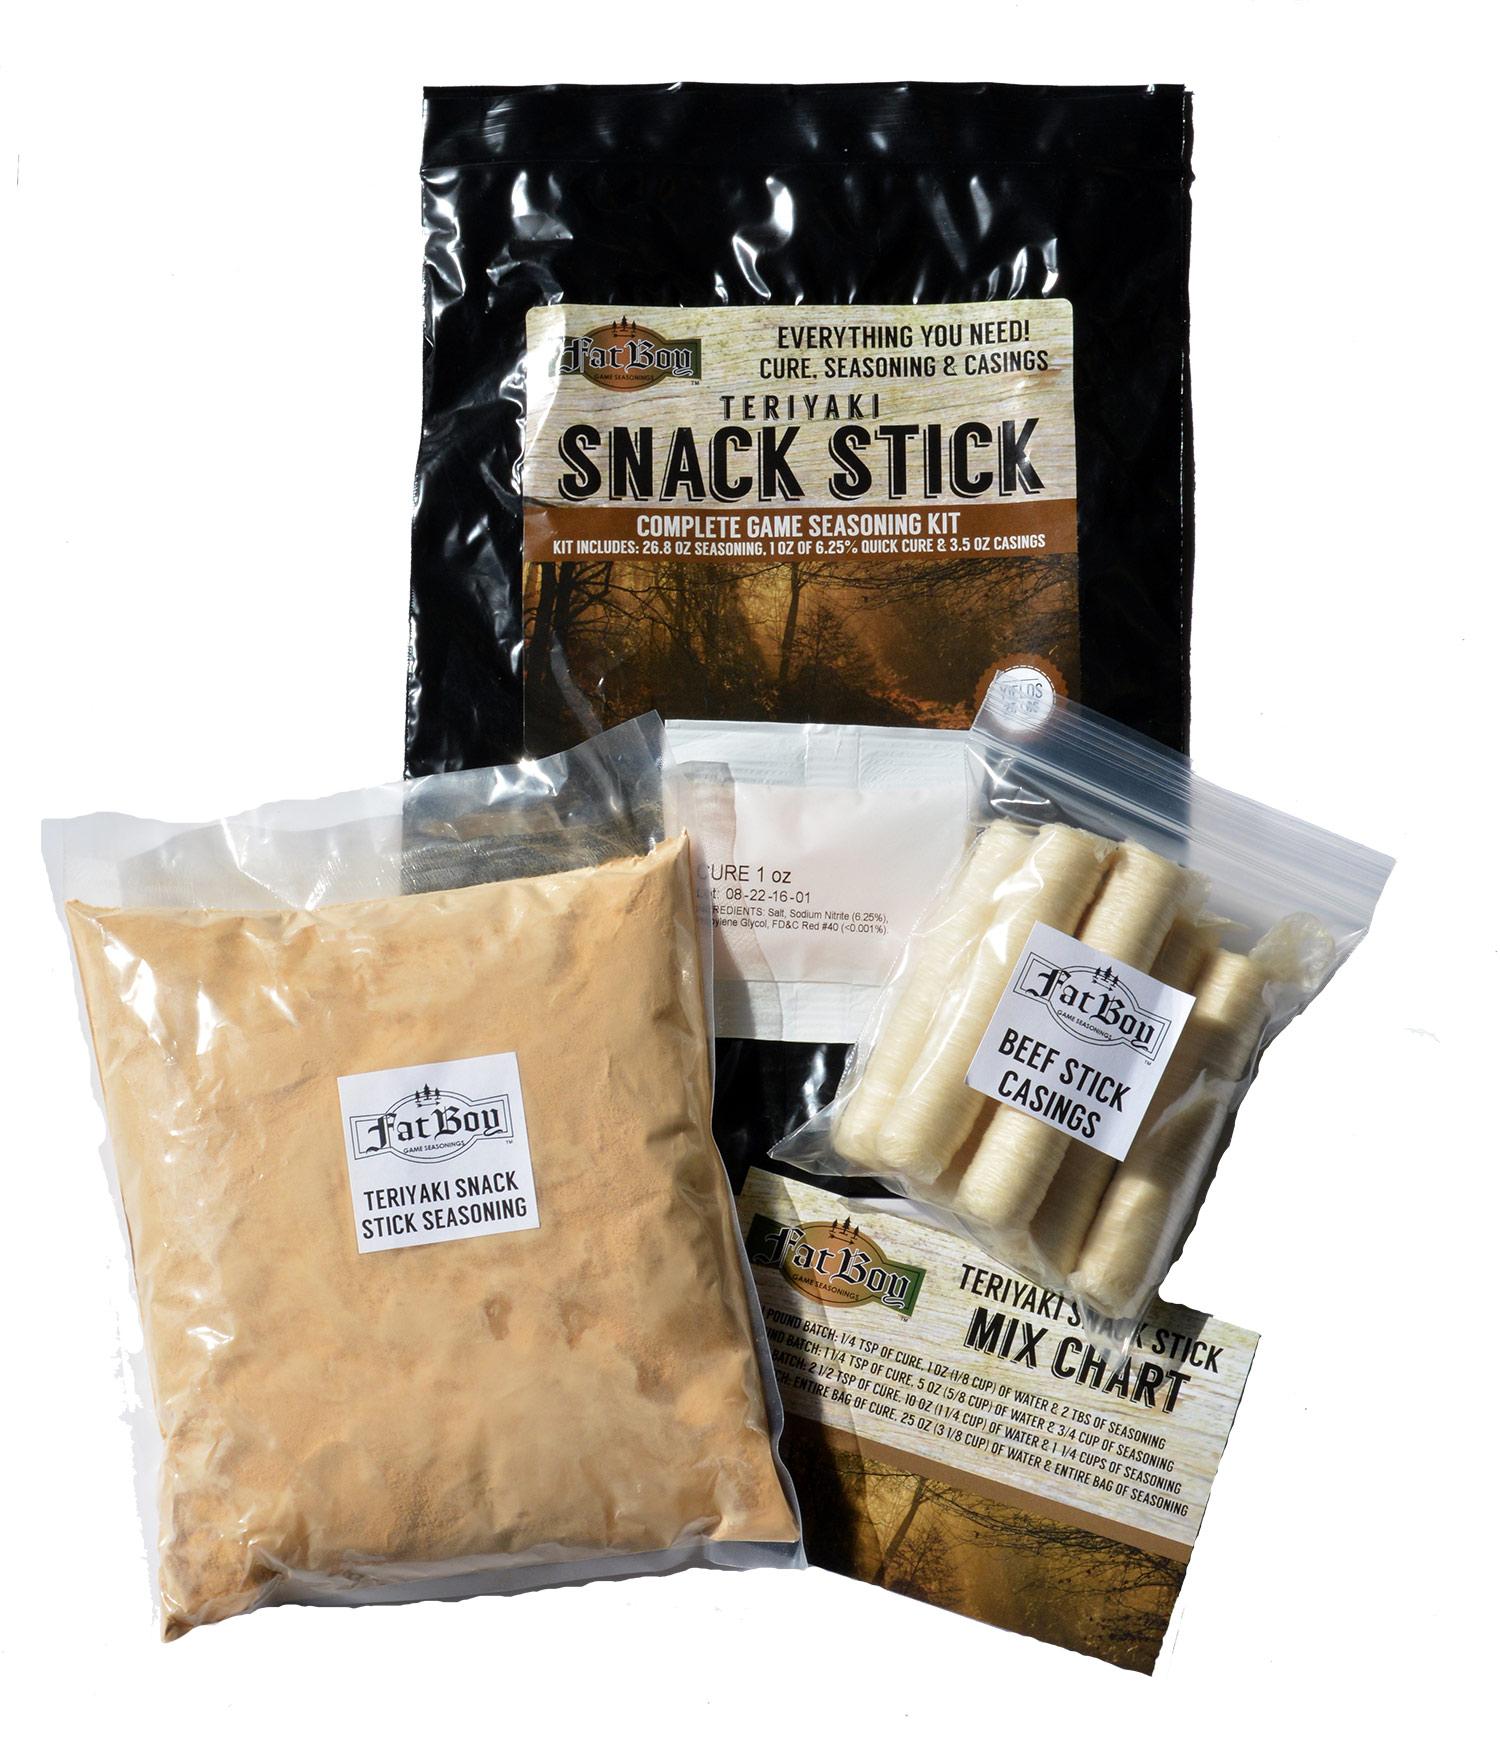 Teriyaki Snack Stick Seasoning Kit Fat Boy Game Seasonings